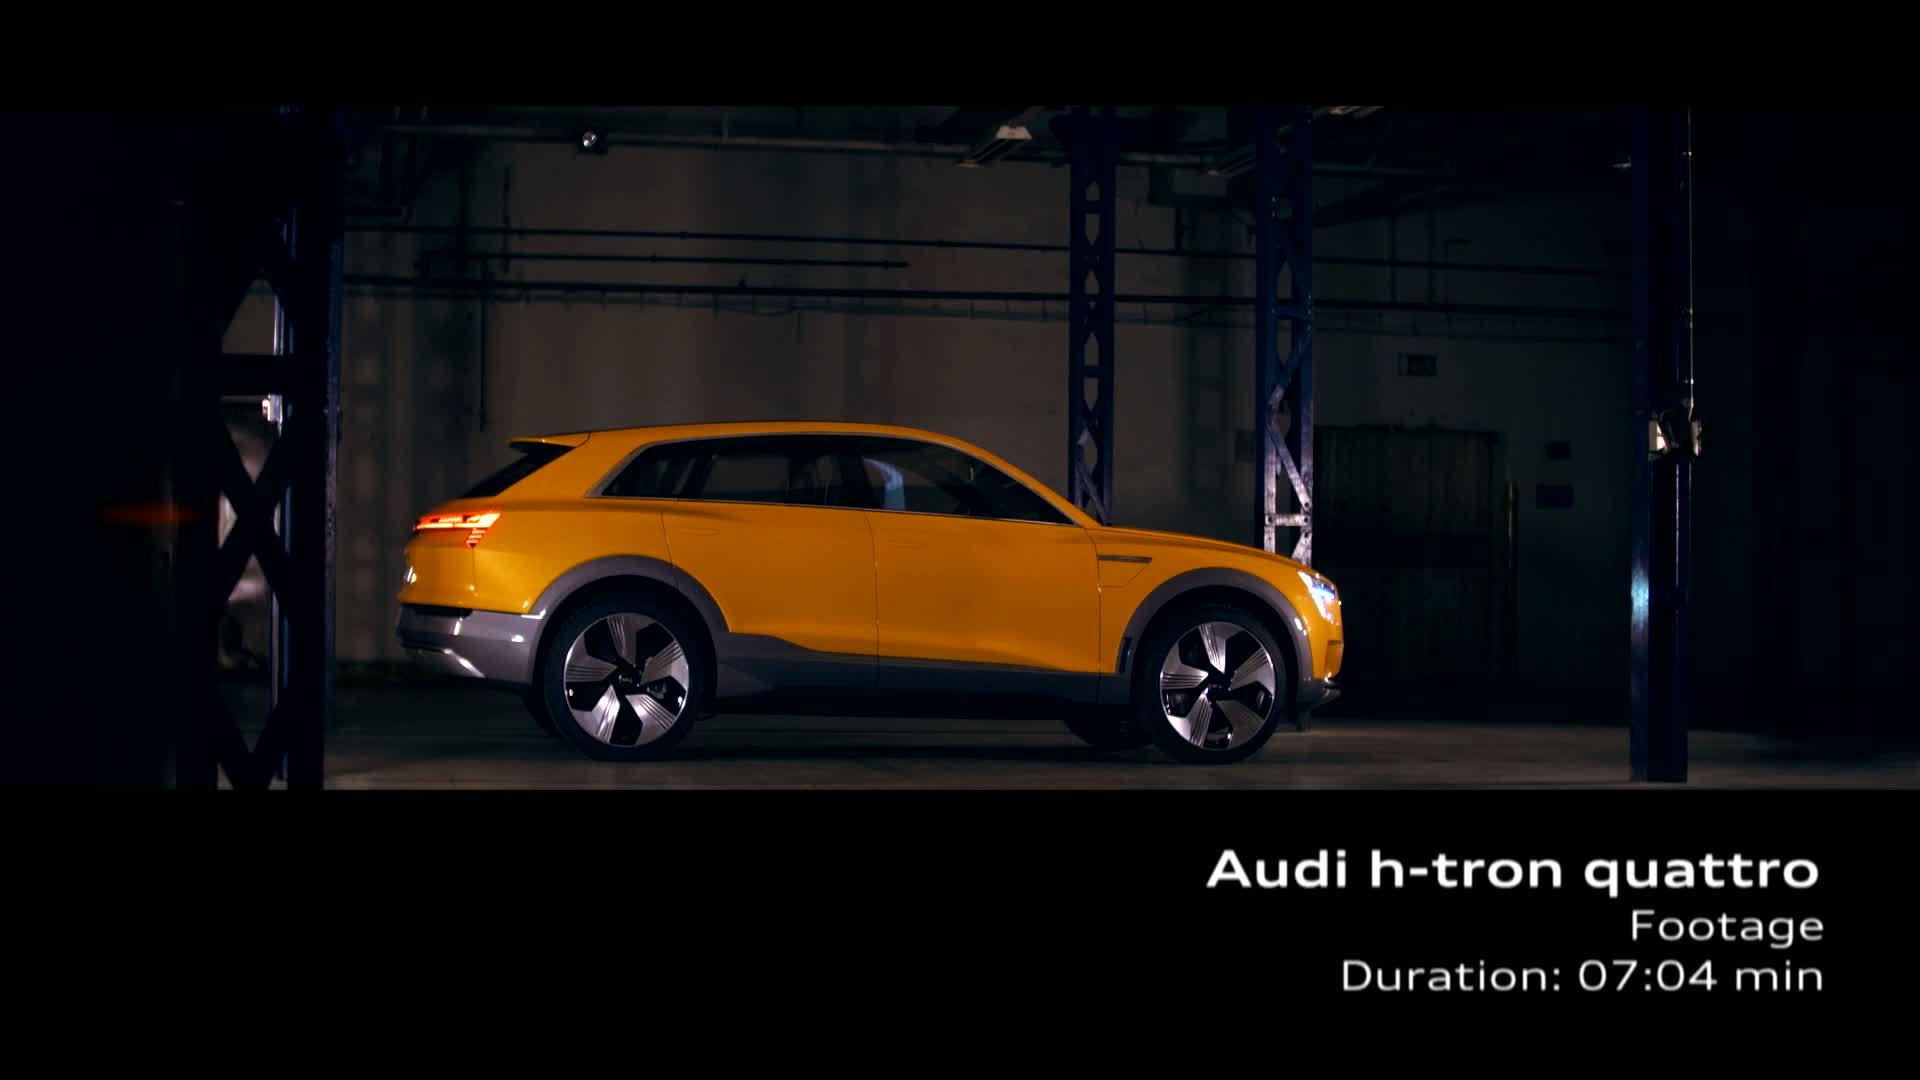 Audi h-tron quattro concept - Footage